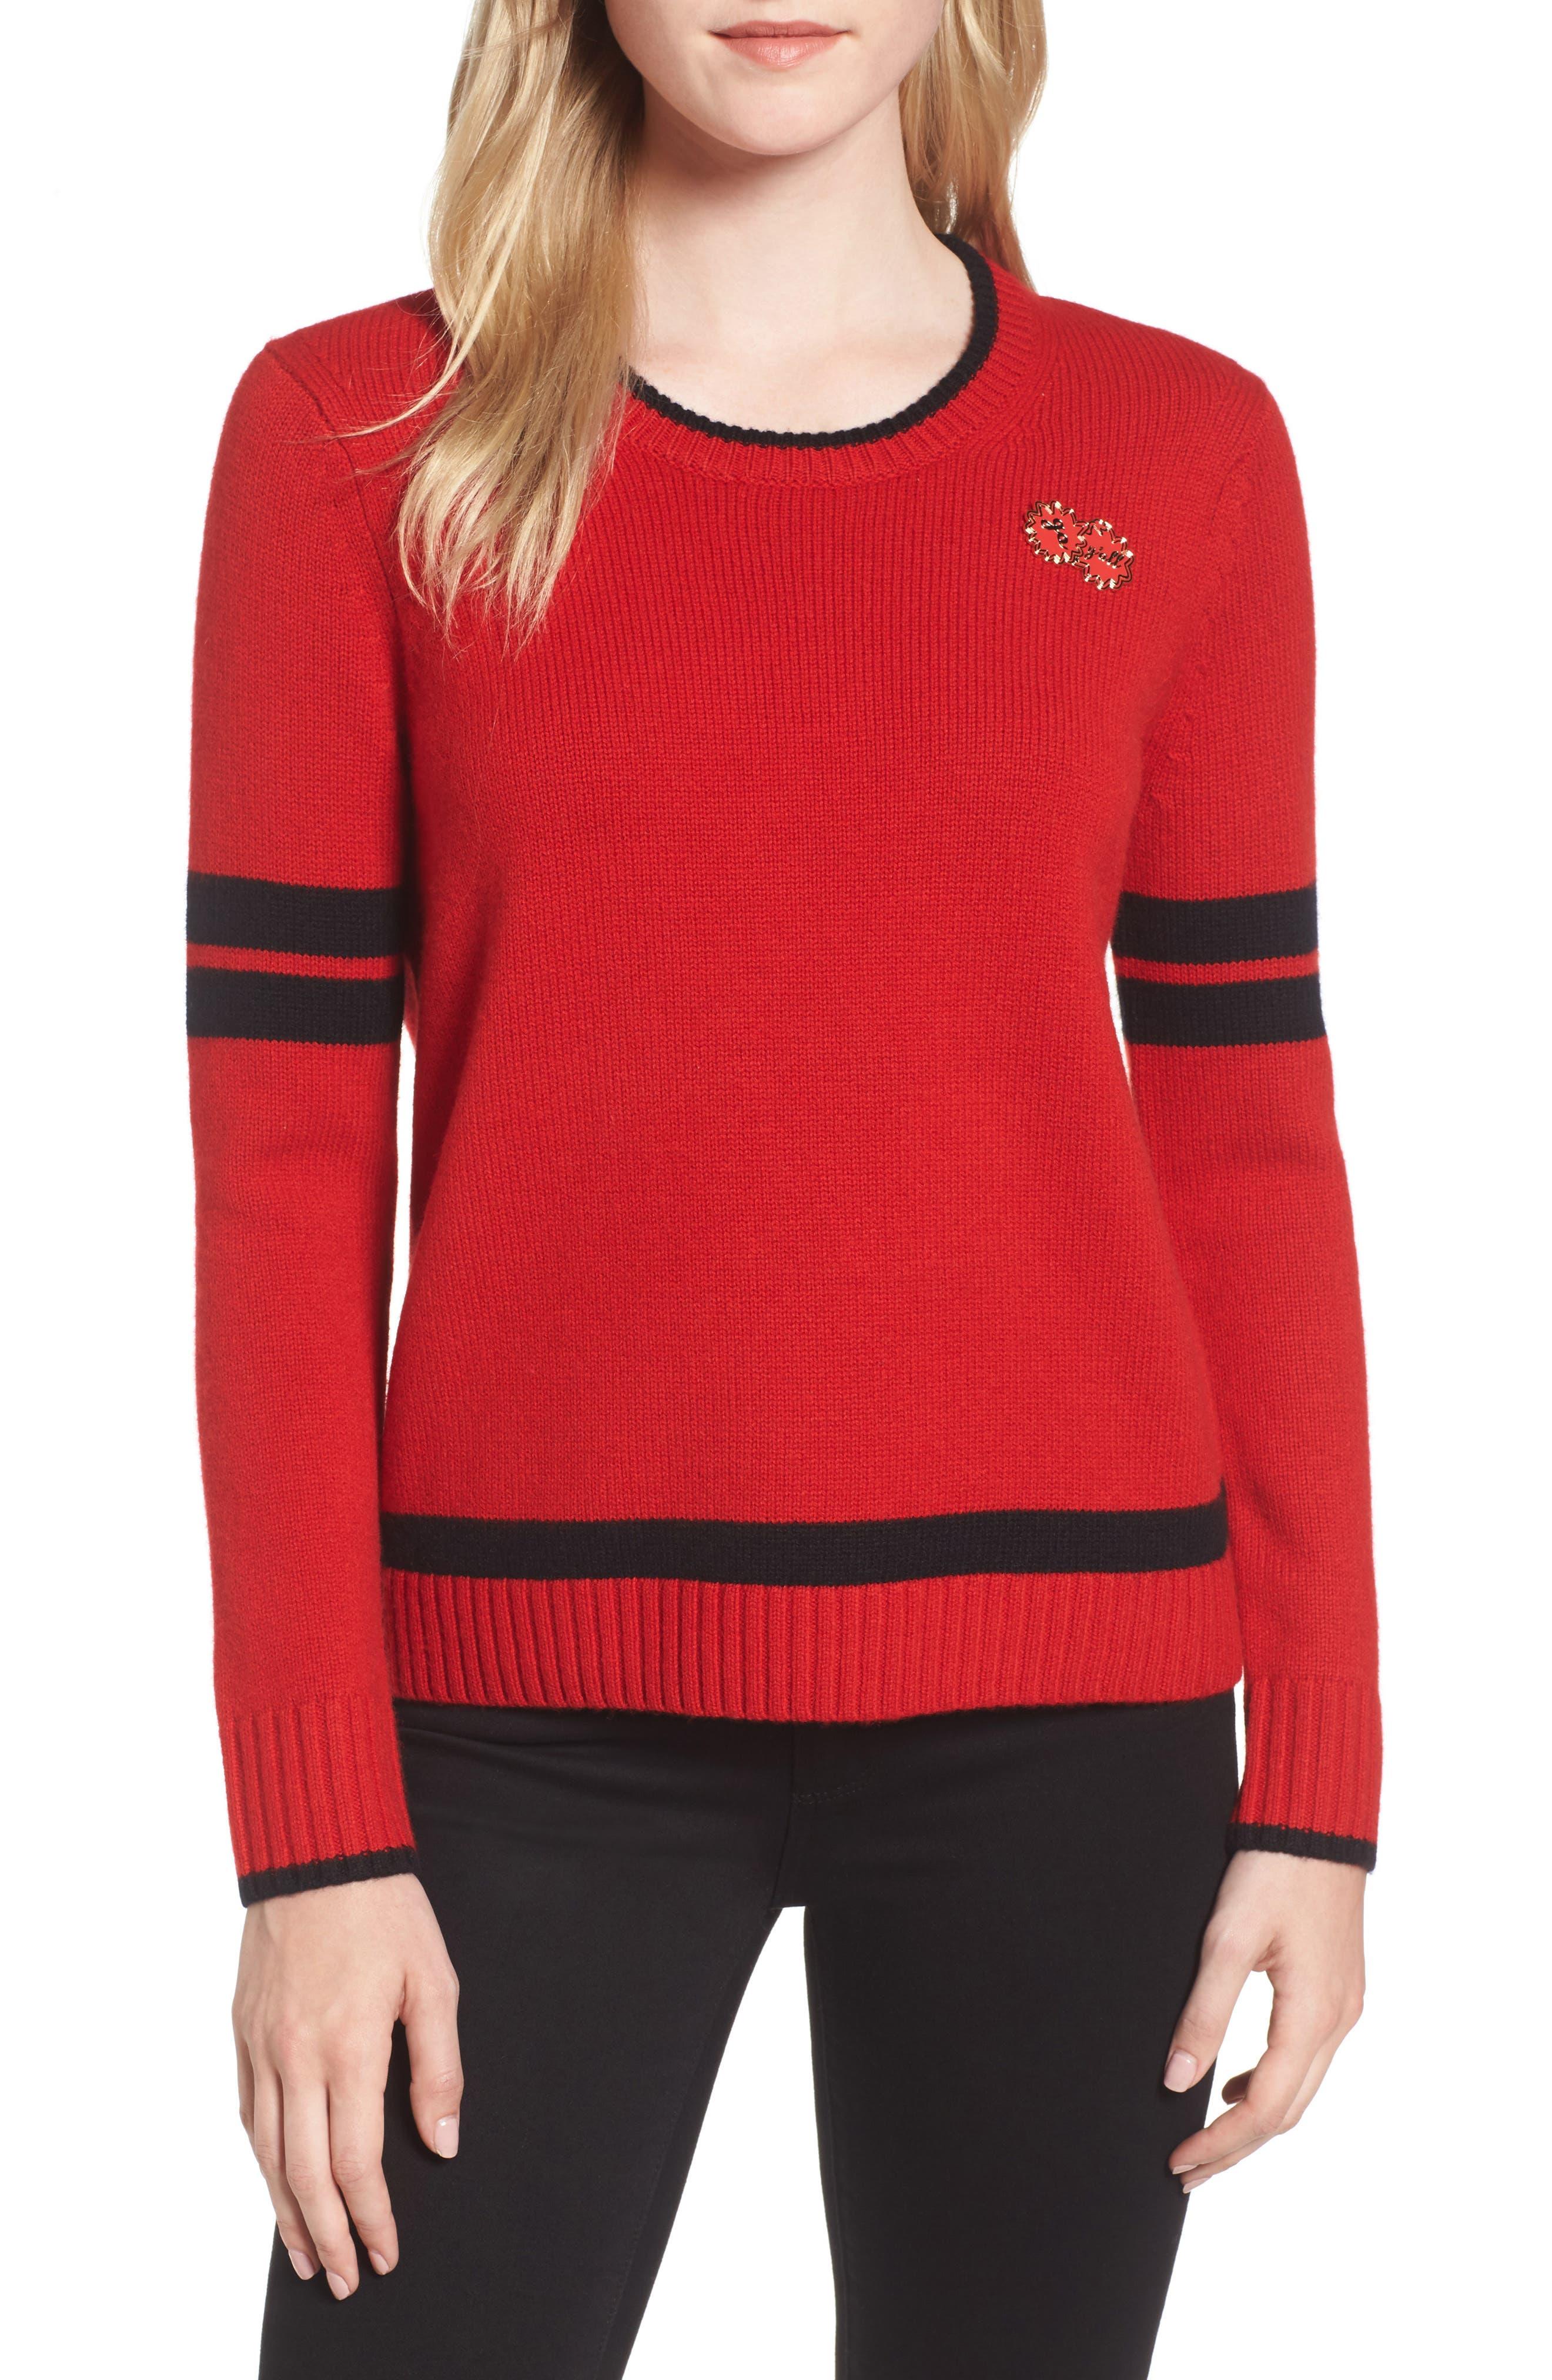 Spirit Sweater,                             Main thumbnail 1, color,                             006